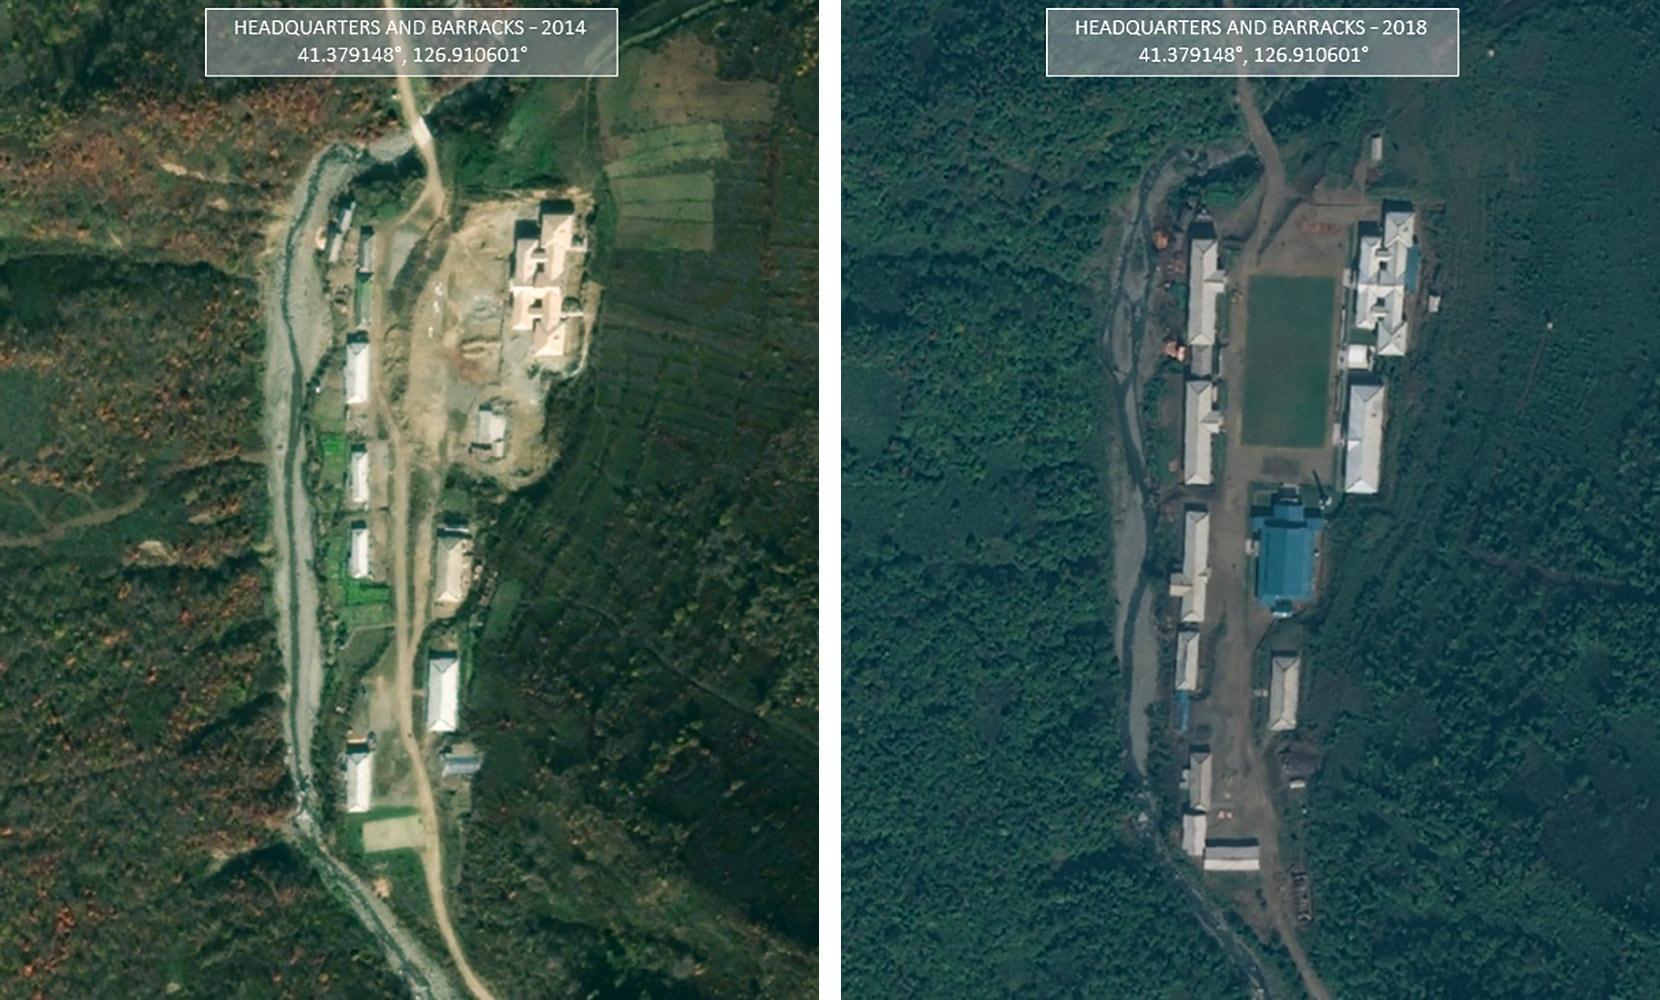 Satellite imagery North Korea Ballistic missile site